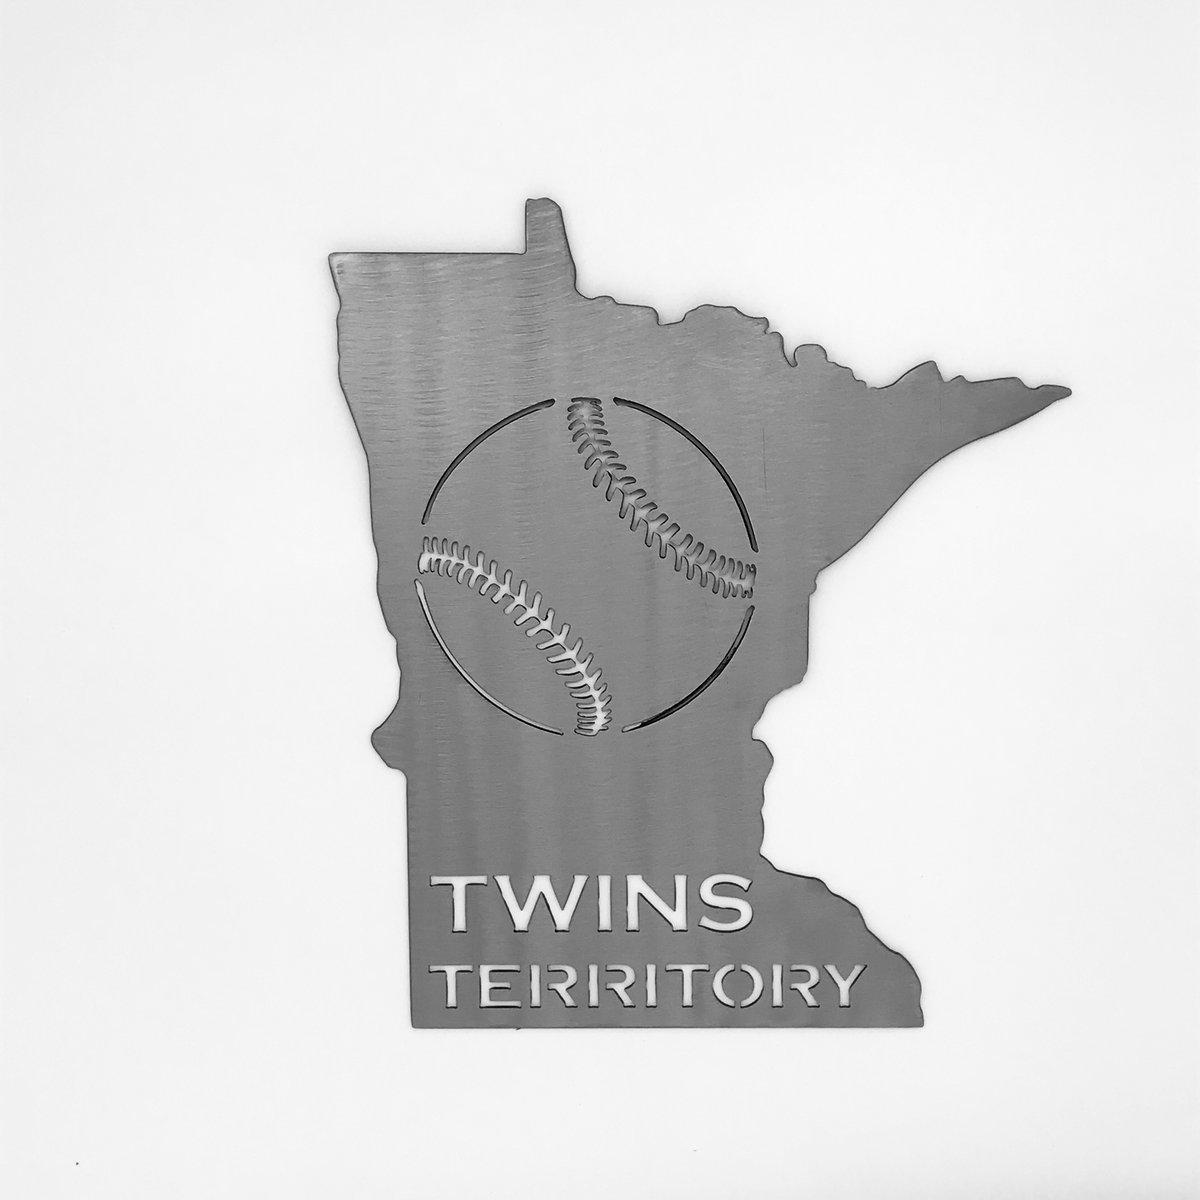 Twins Territory